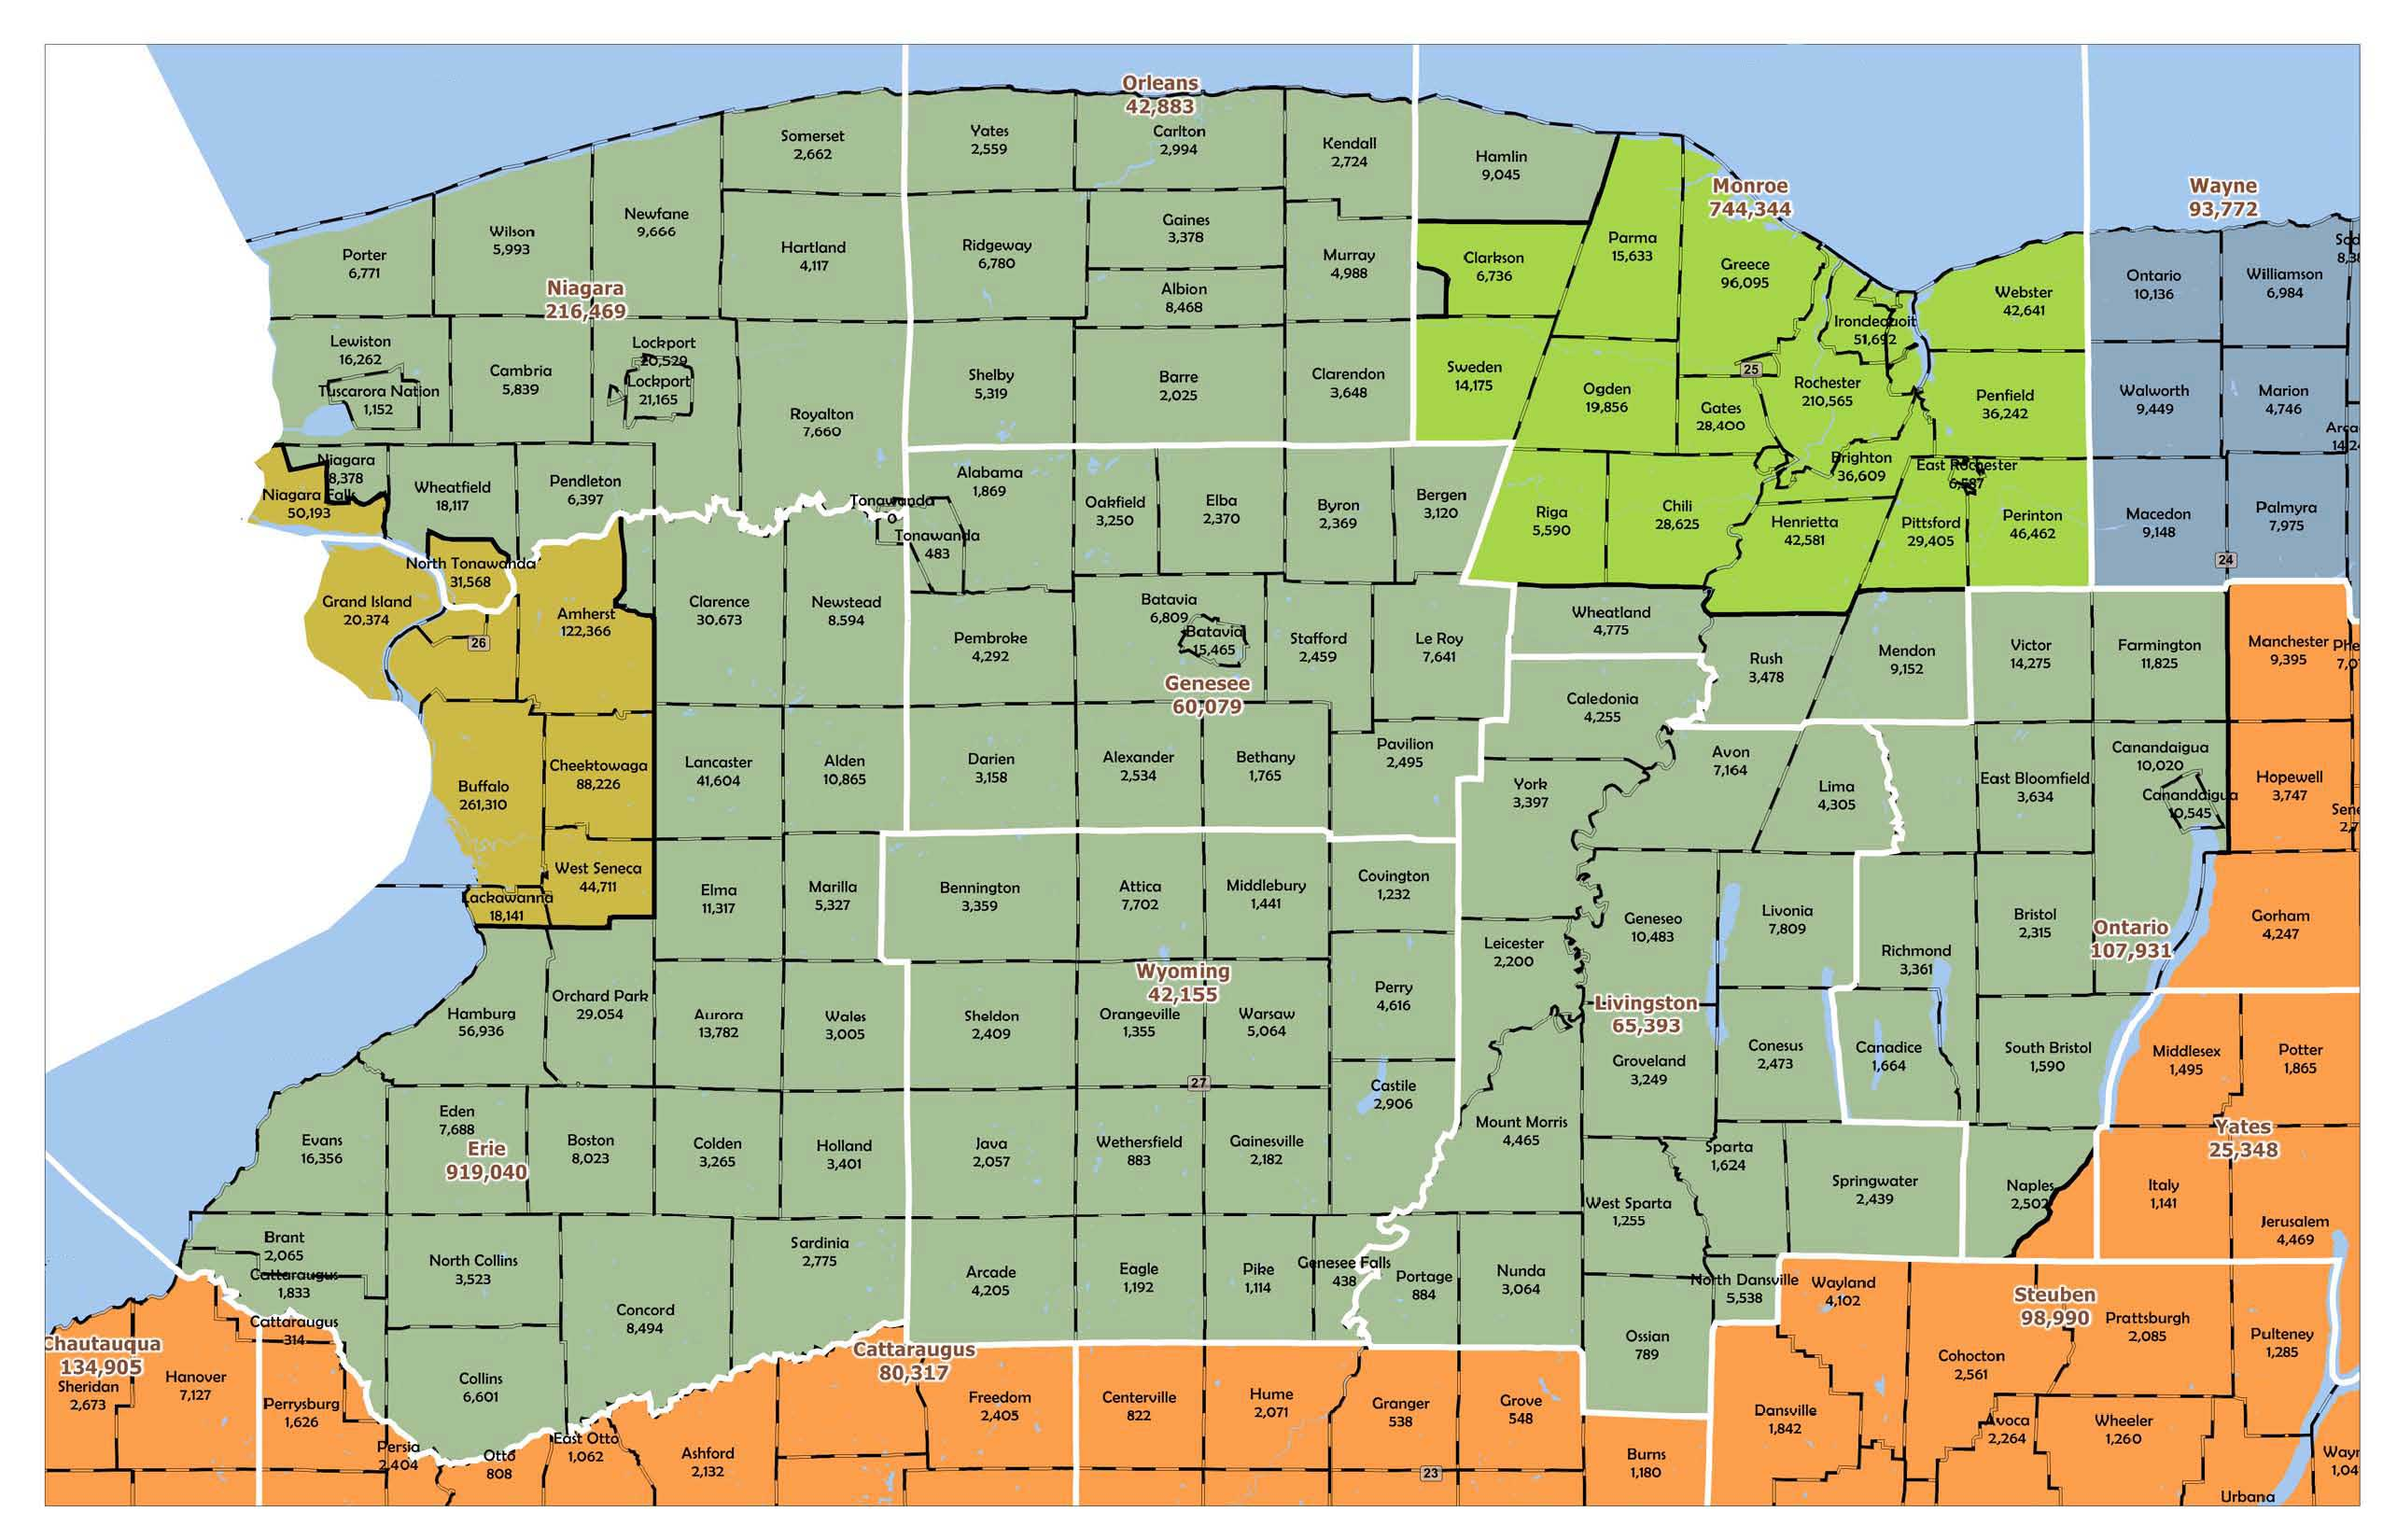 The 27th Congressional district battleground.